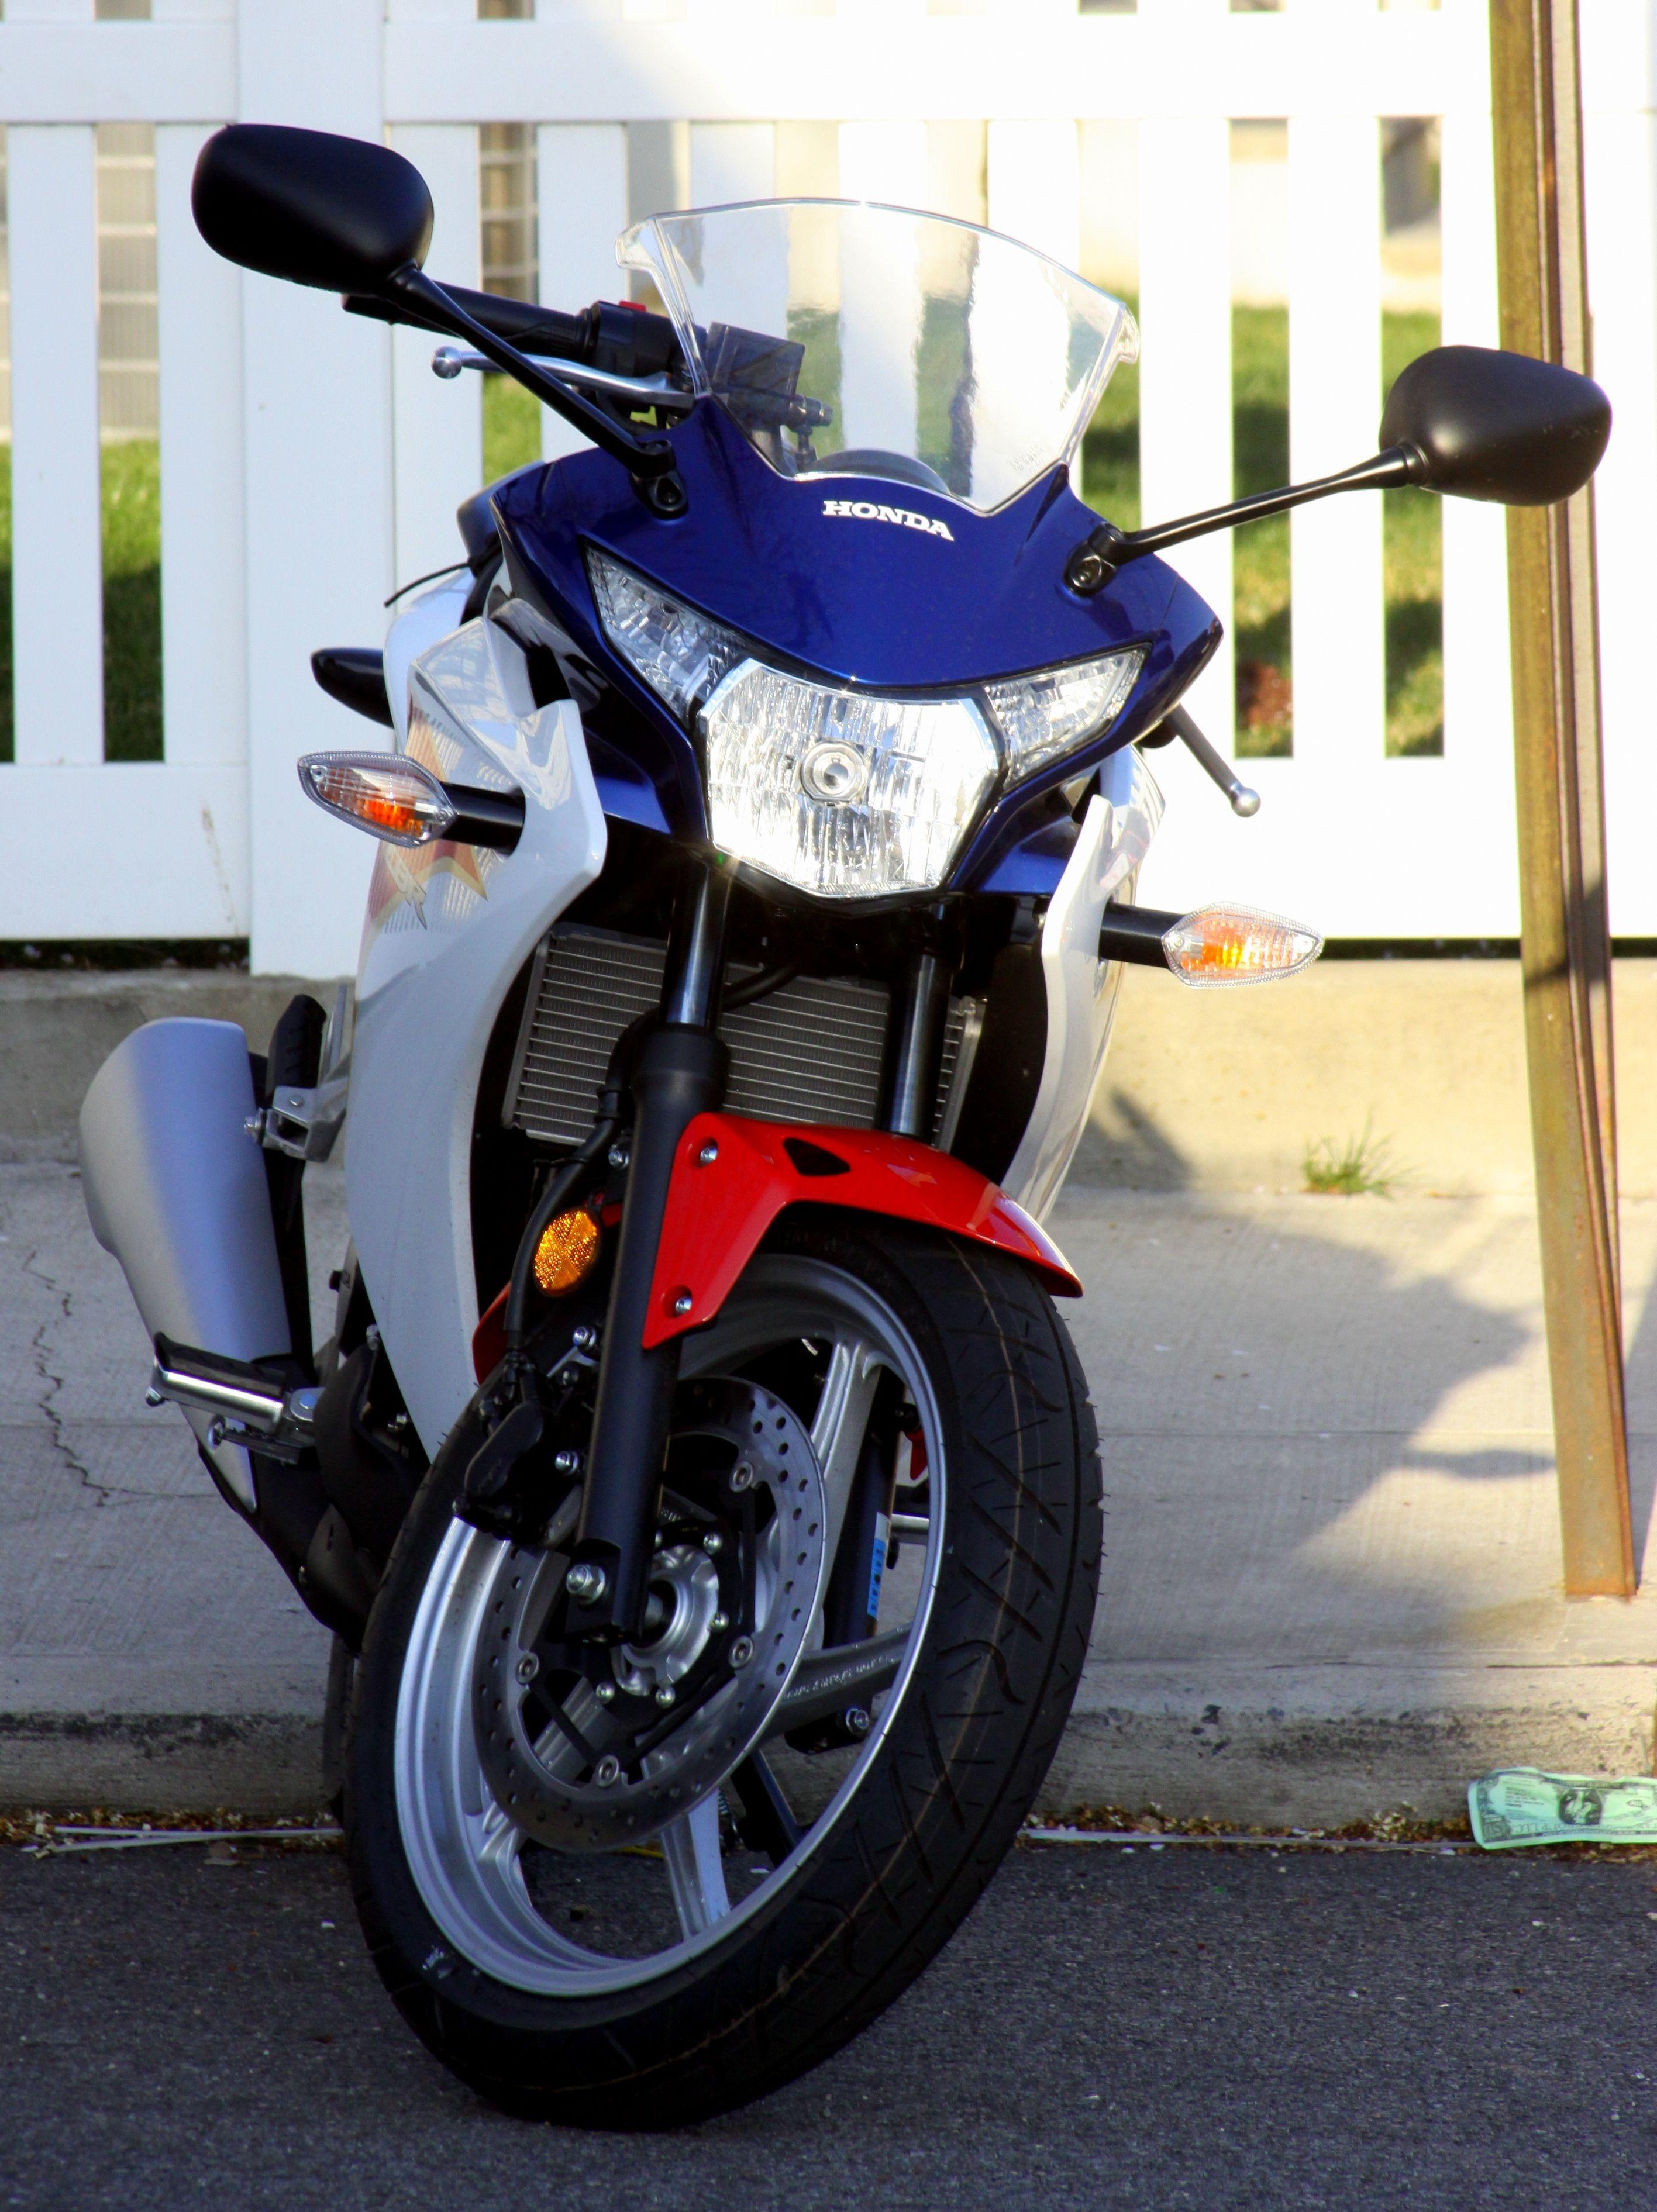 american dreamjulia rozental honda motorcycle red white and